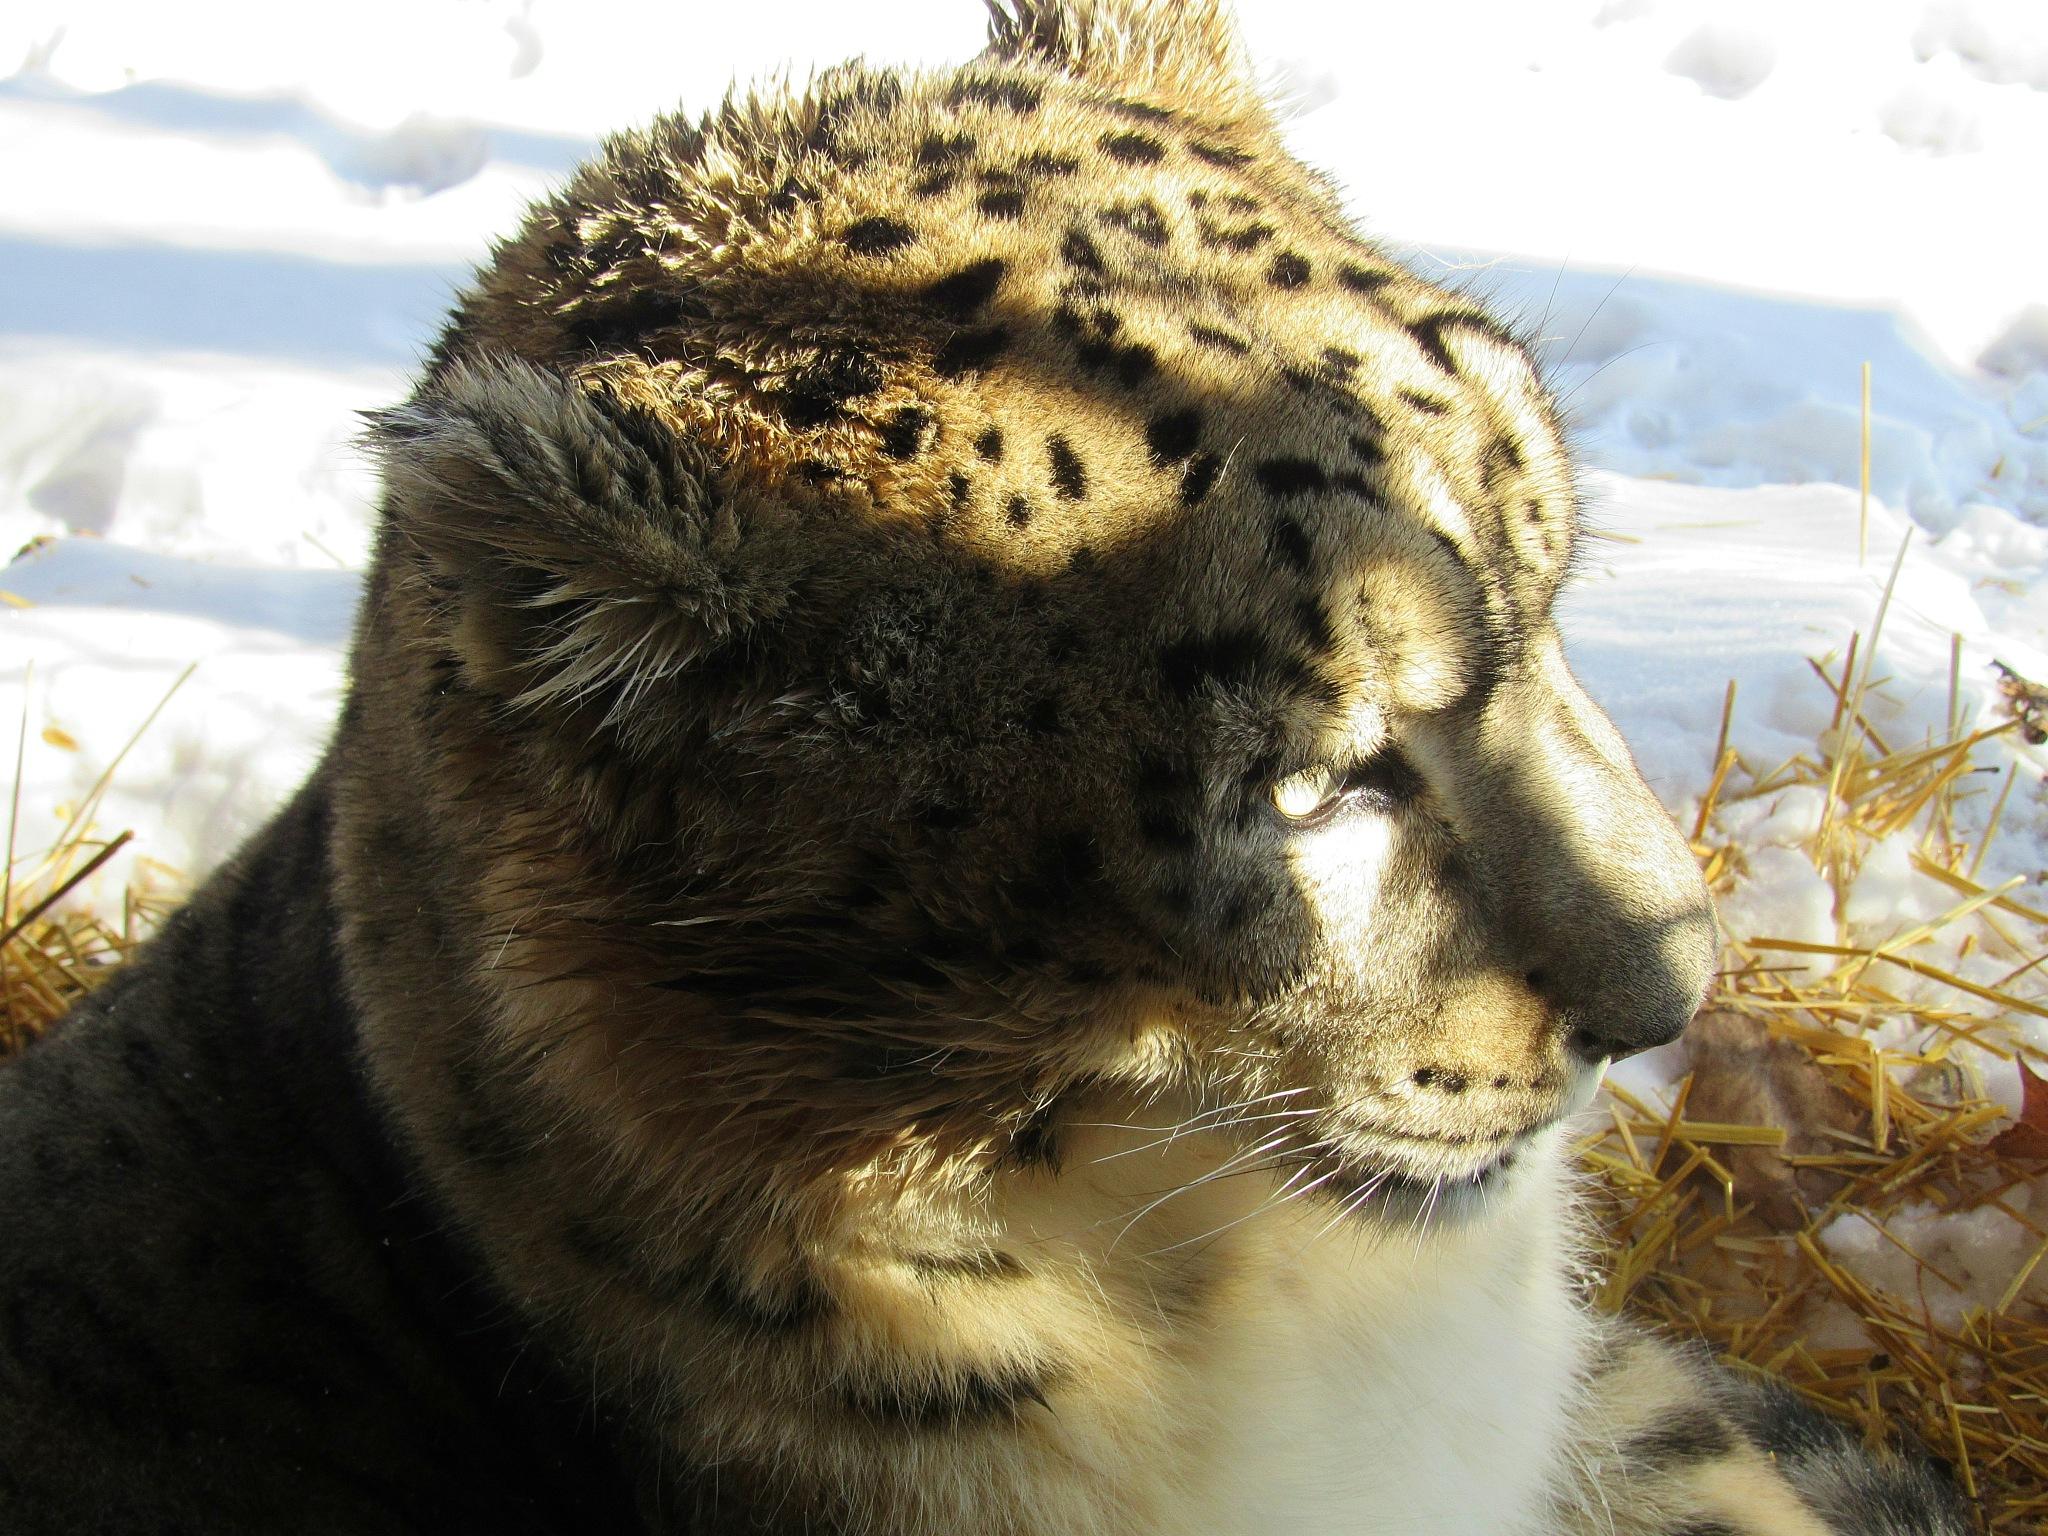 Light Play on Snow Leopard Profile by Carla Hepp